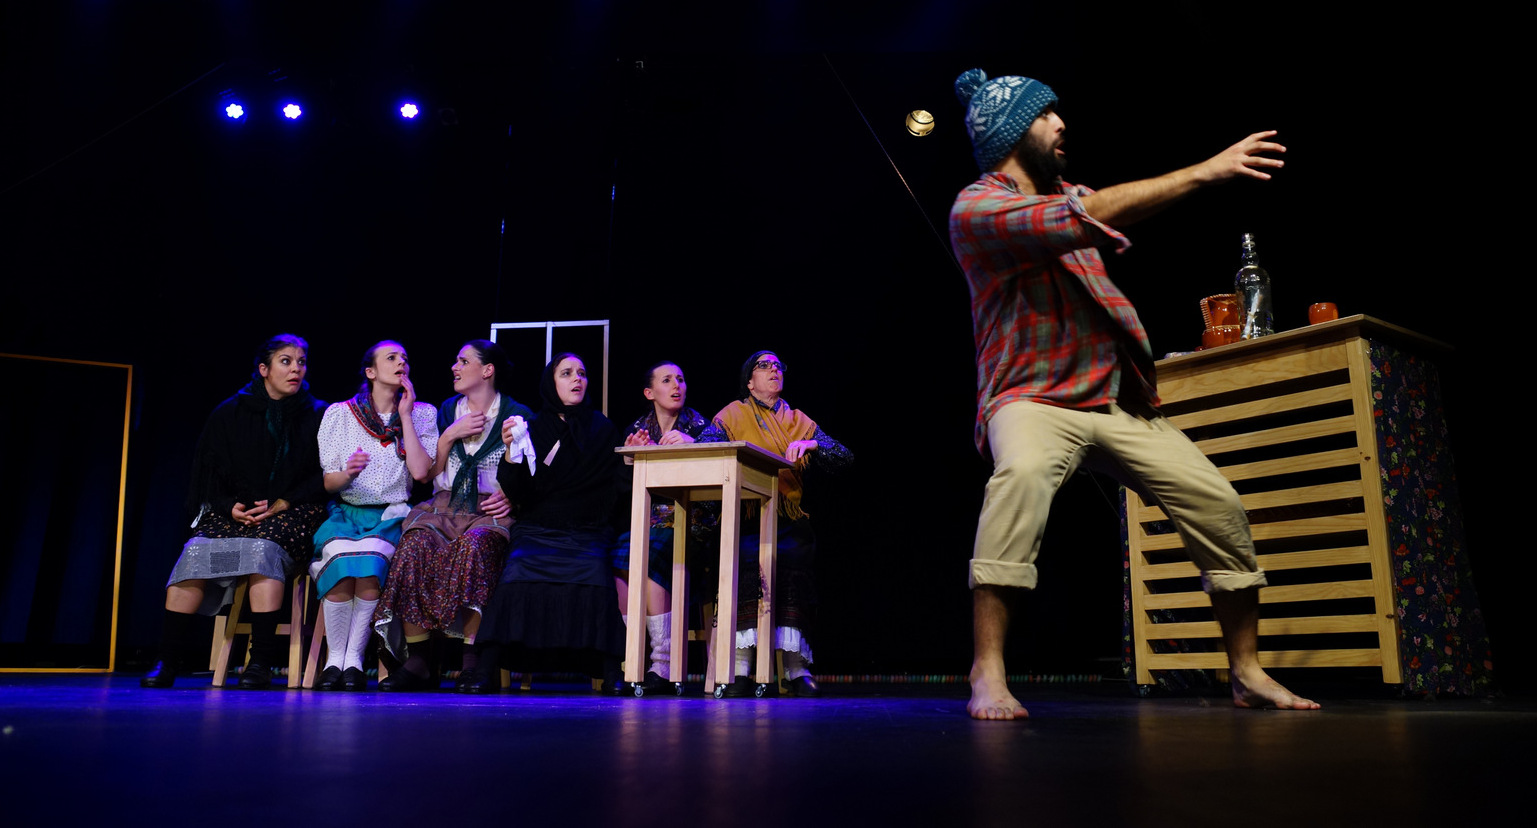 Município promove 2.º Festival de Teatro  Amador de Esposende